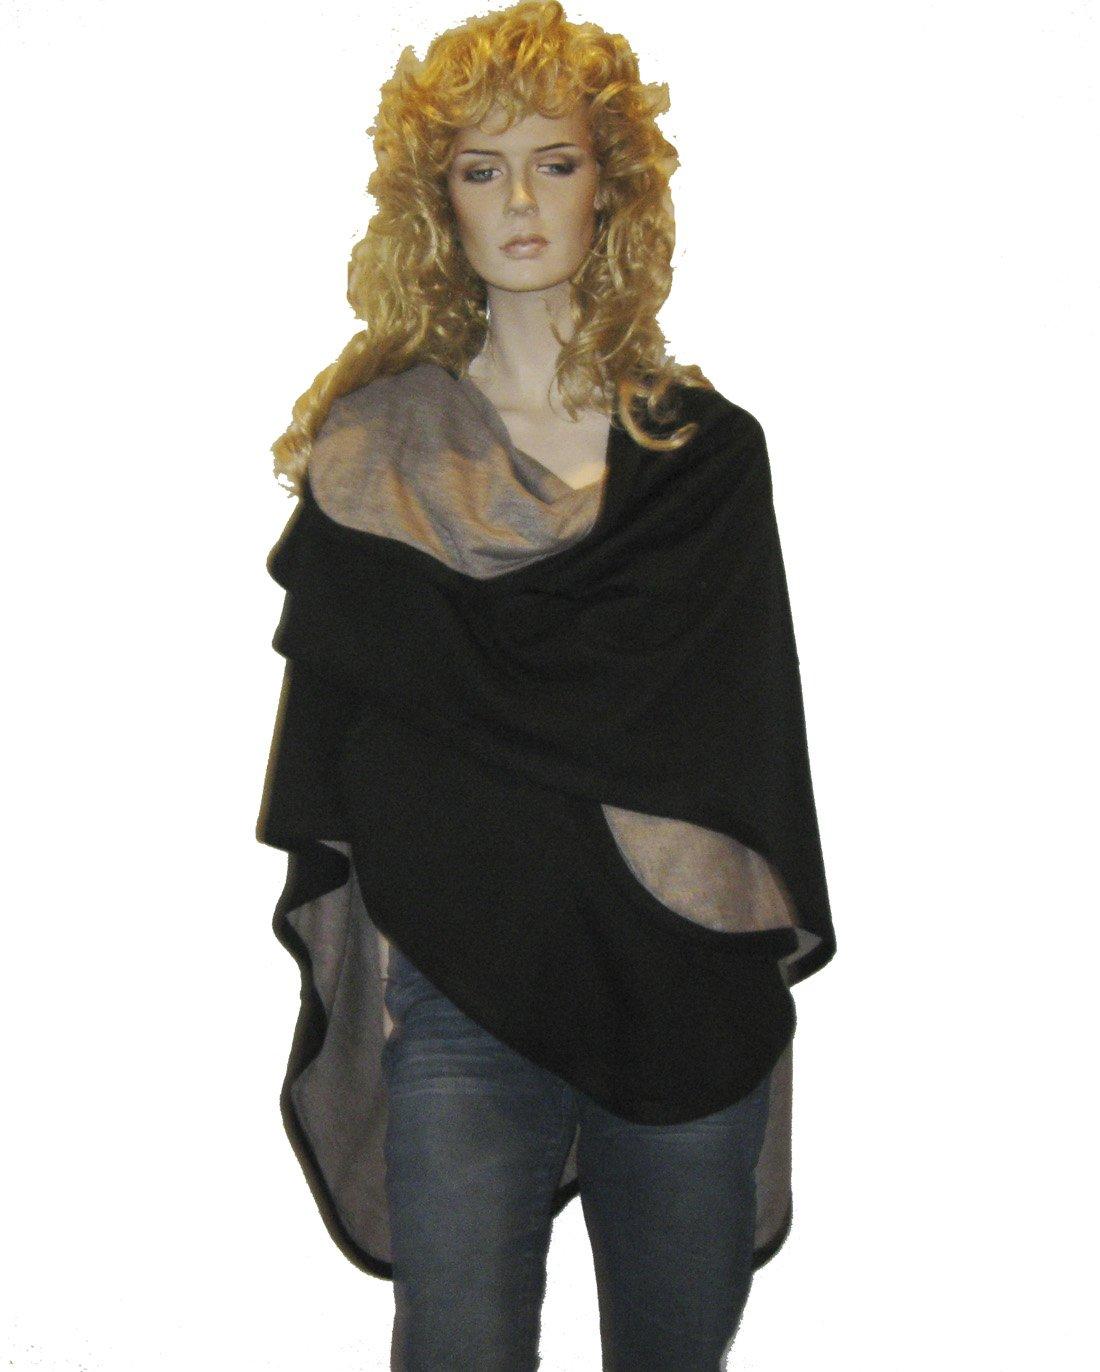 Cashmere Pashmina Group- Cape Woolen Reversible Ruana Knitted Poncho Shawl Cardigans Sweater Coat (Black/ Stone) by Cashmere Pashmina Group (Image #1)